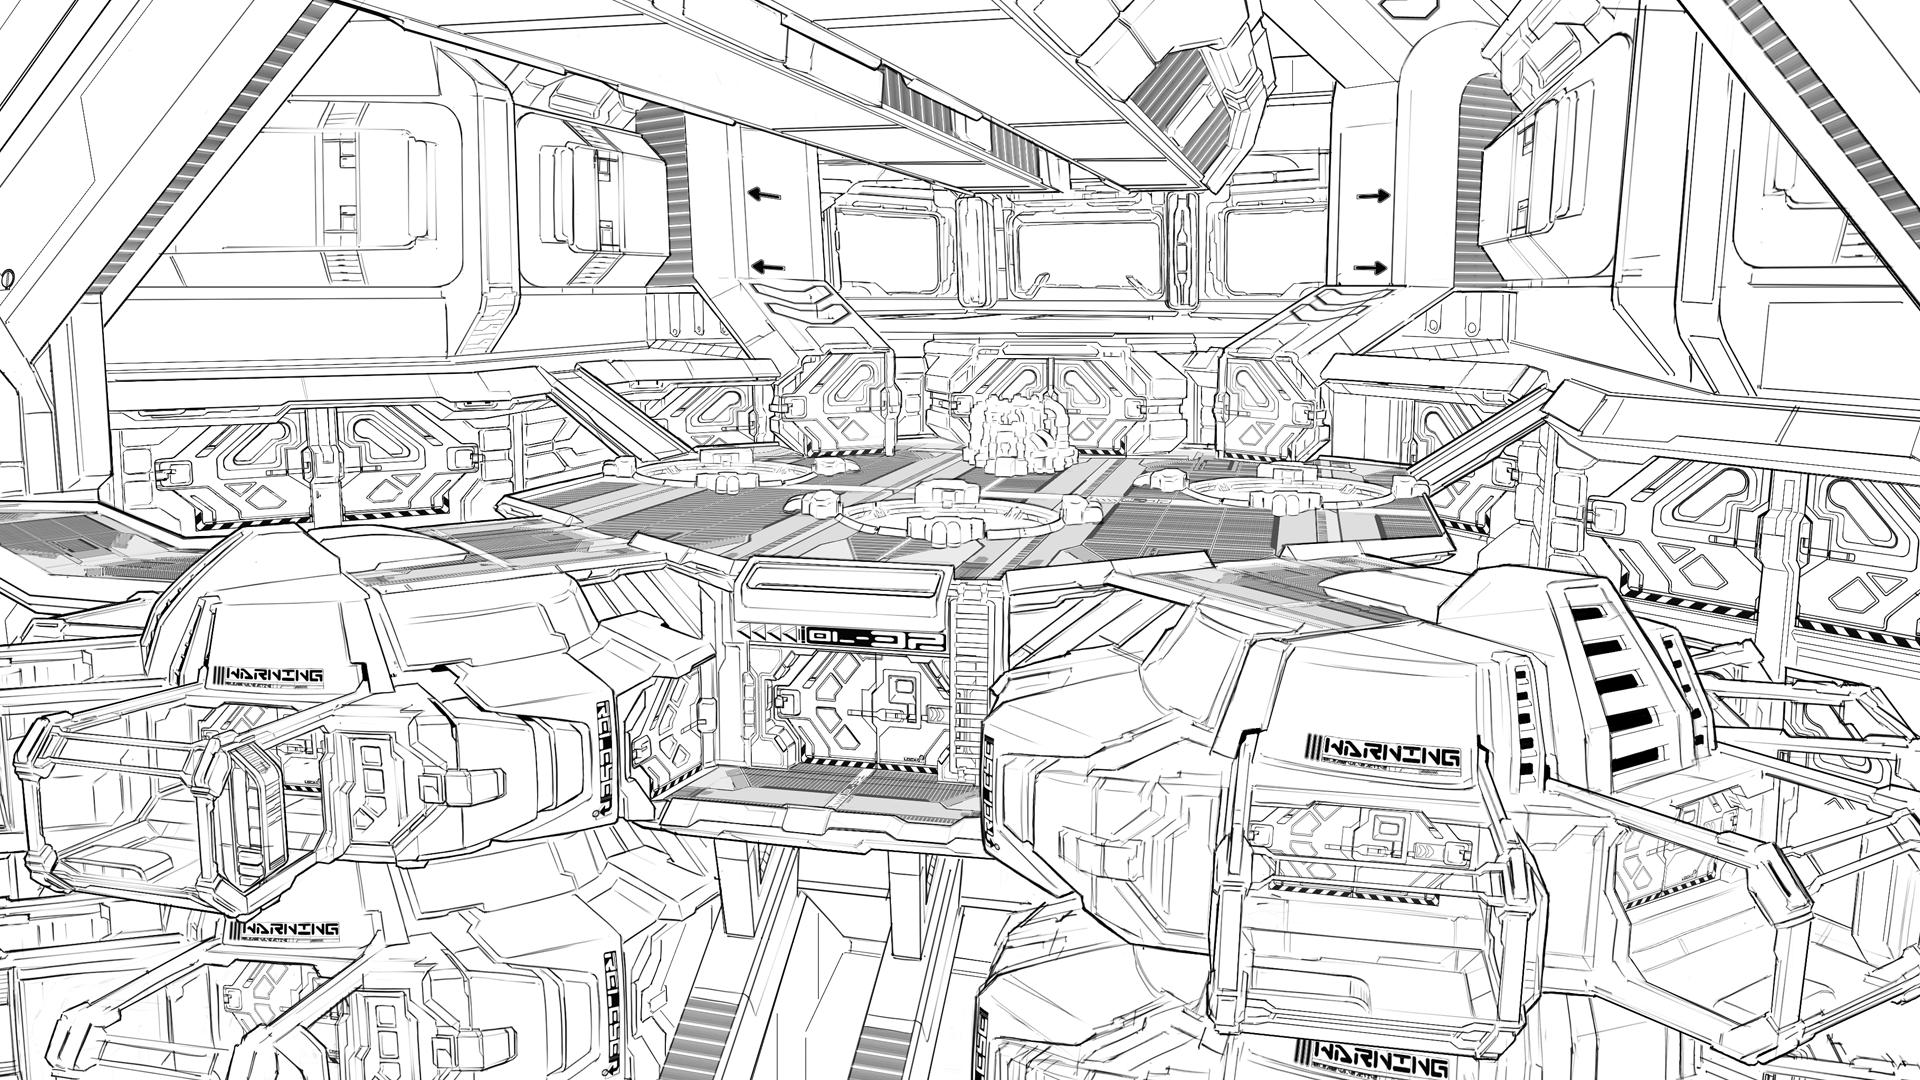 Space Station Infestation